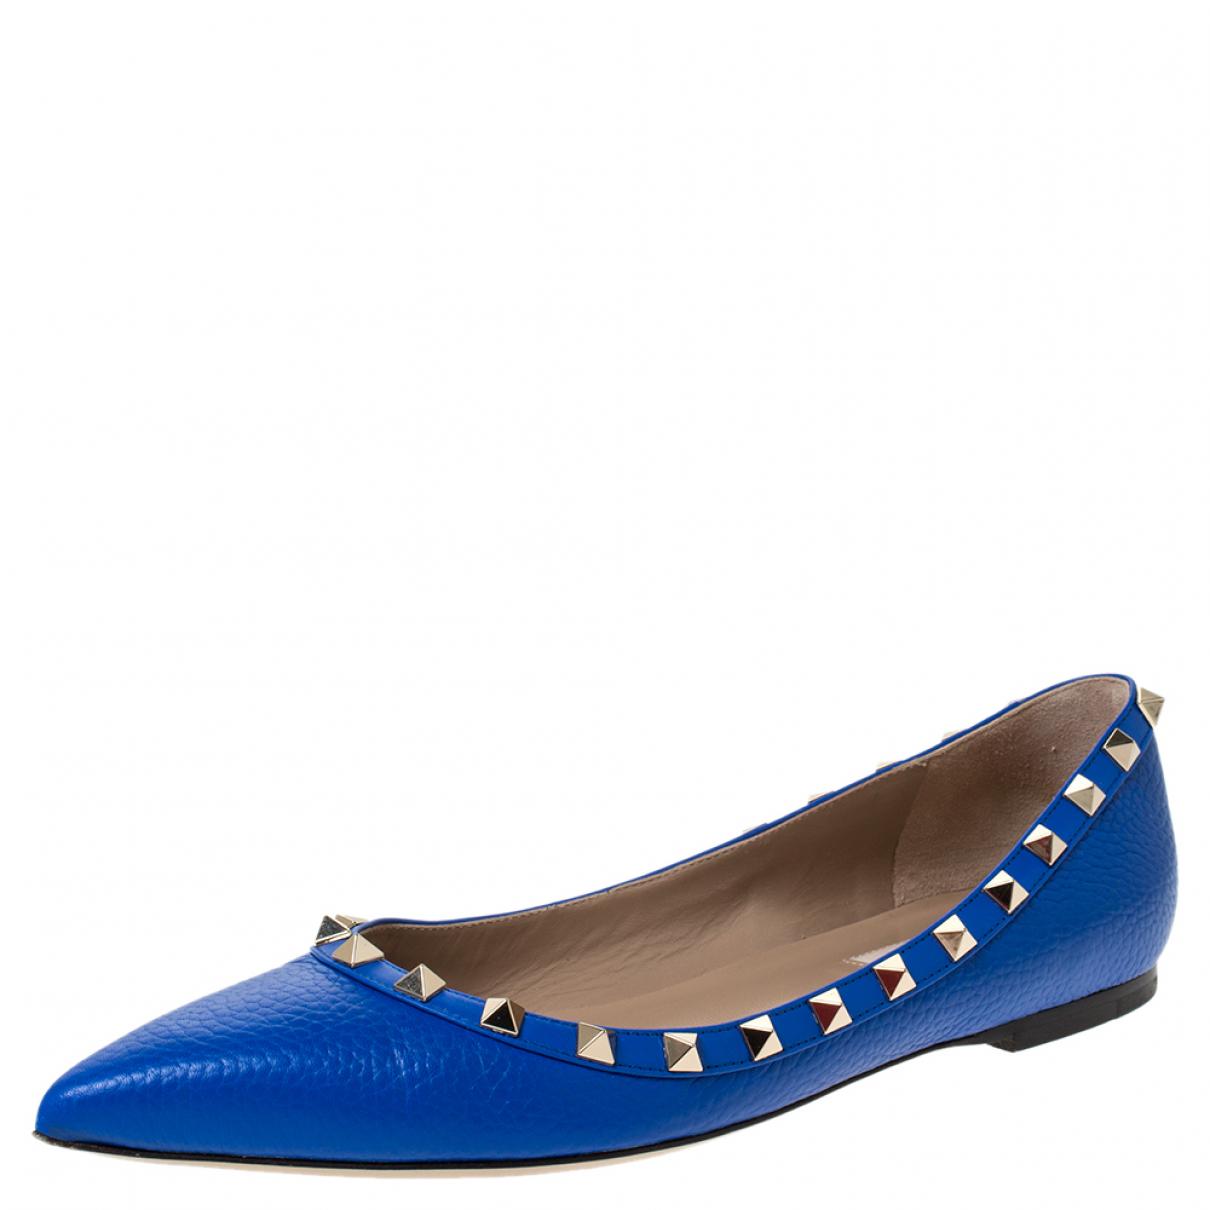 Valentino Garavani \N Blue Leather Flats for Women 8 US